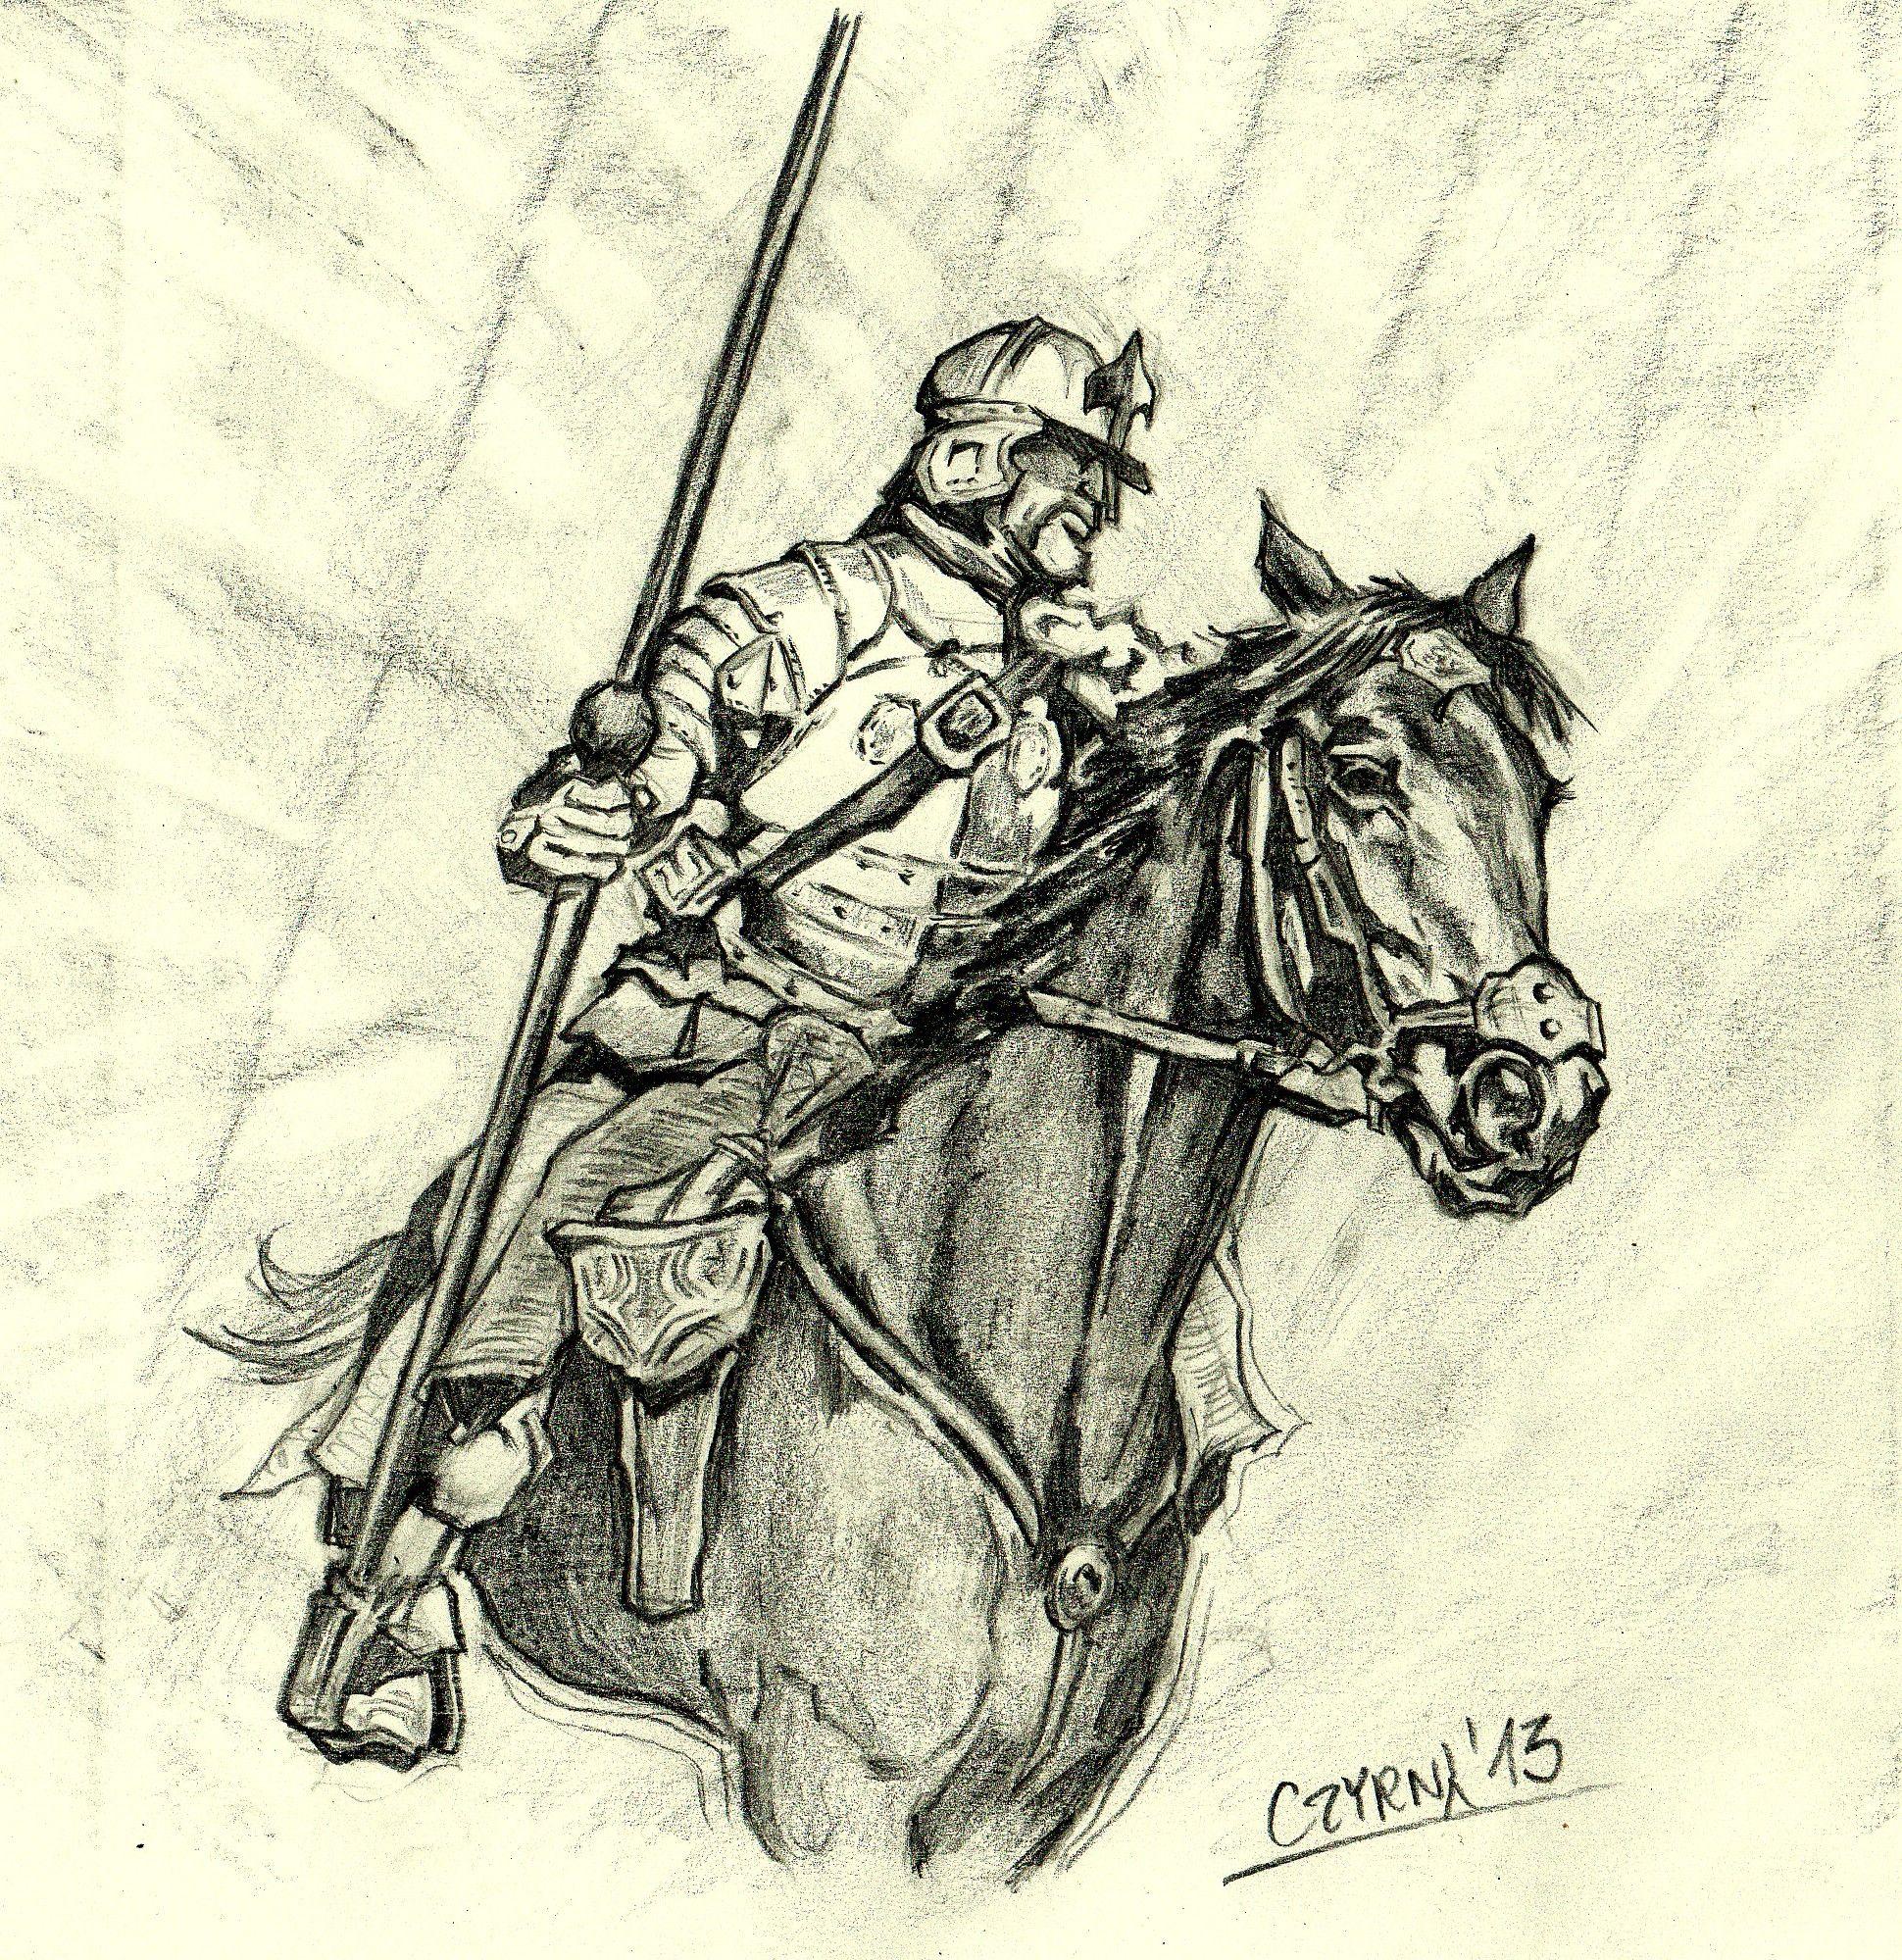 Husarz Szkic Winged Hussars Polish Winged Hussars Polish Hussars